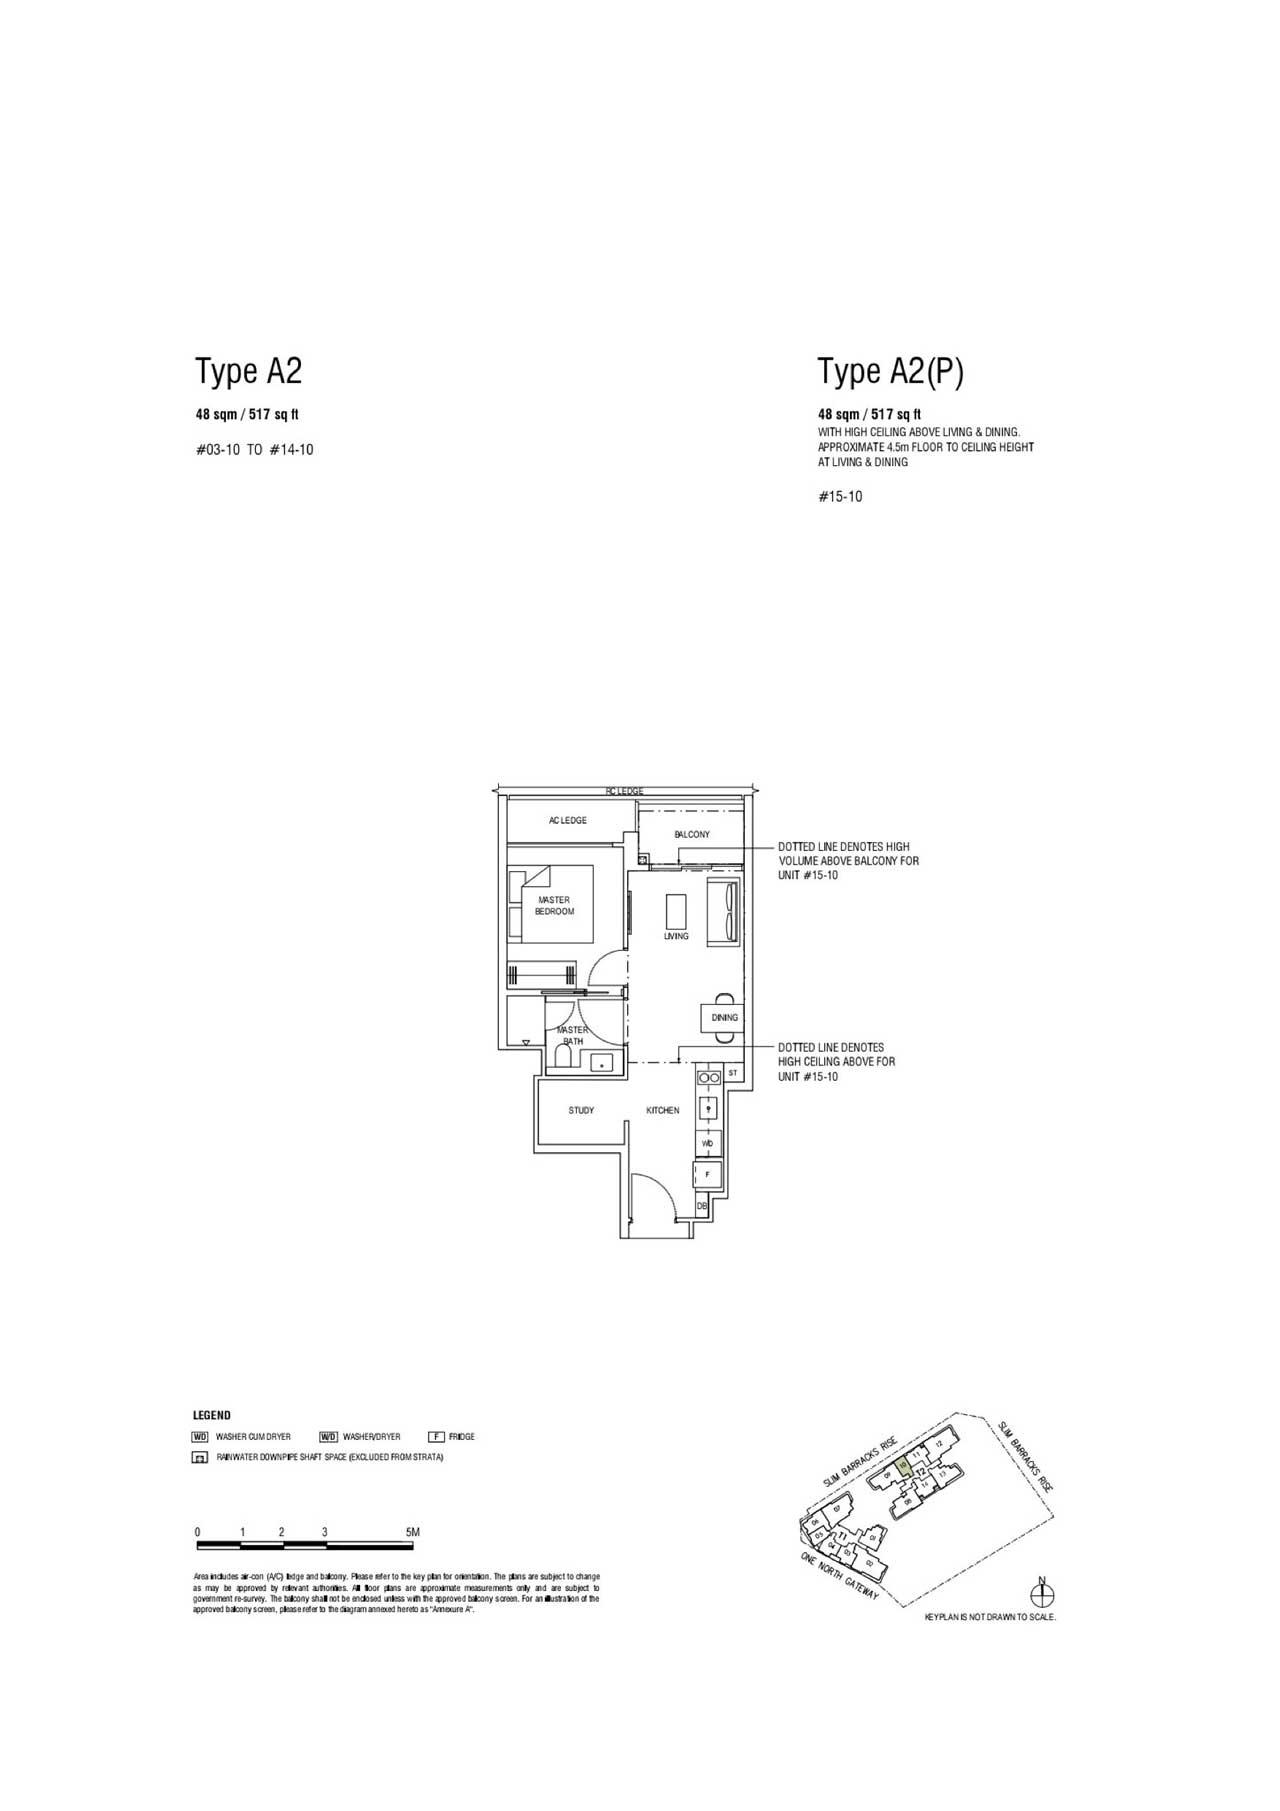 1+Study type A2 - One North Eden Floor Plan, Showflat Layout